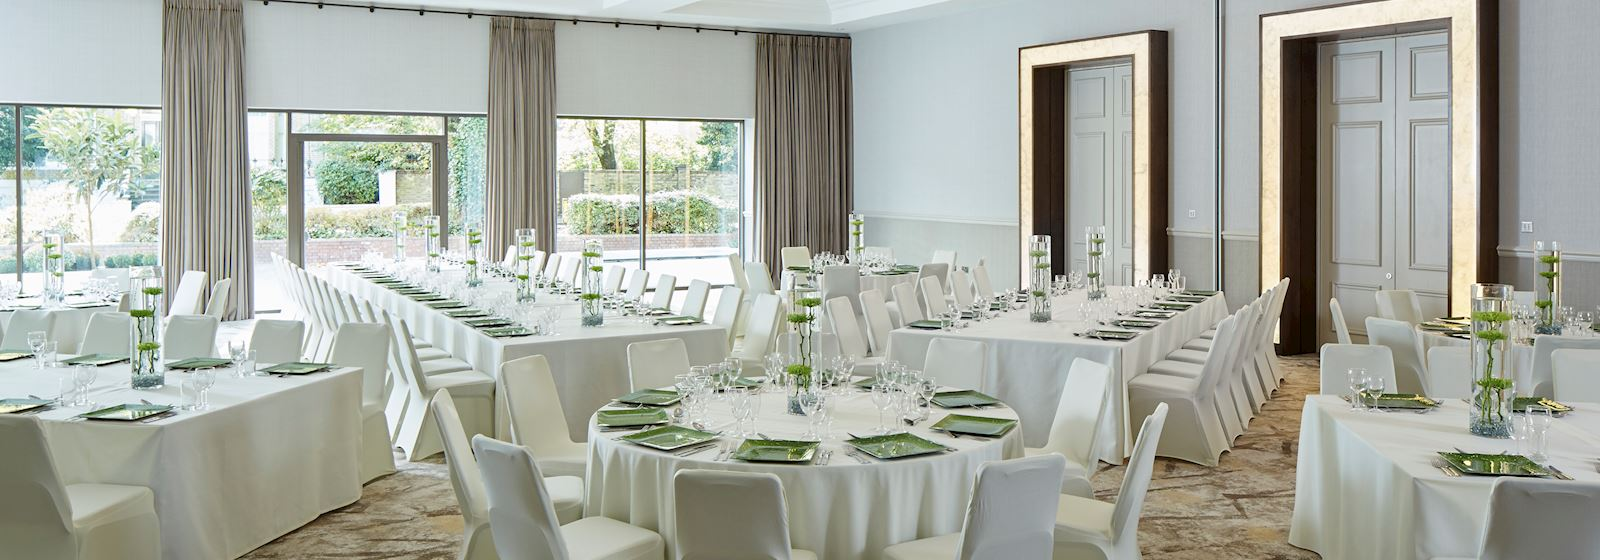 London Marriott Hotel Regents Park Weddings